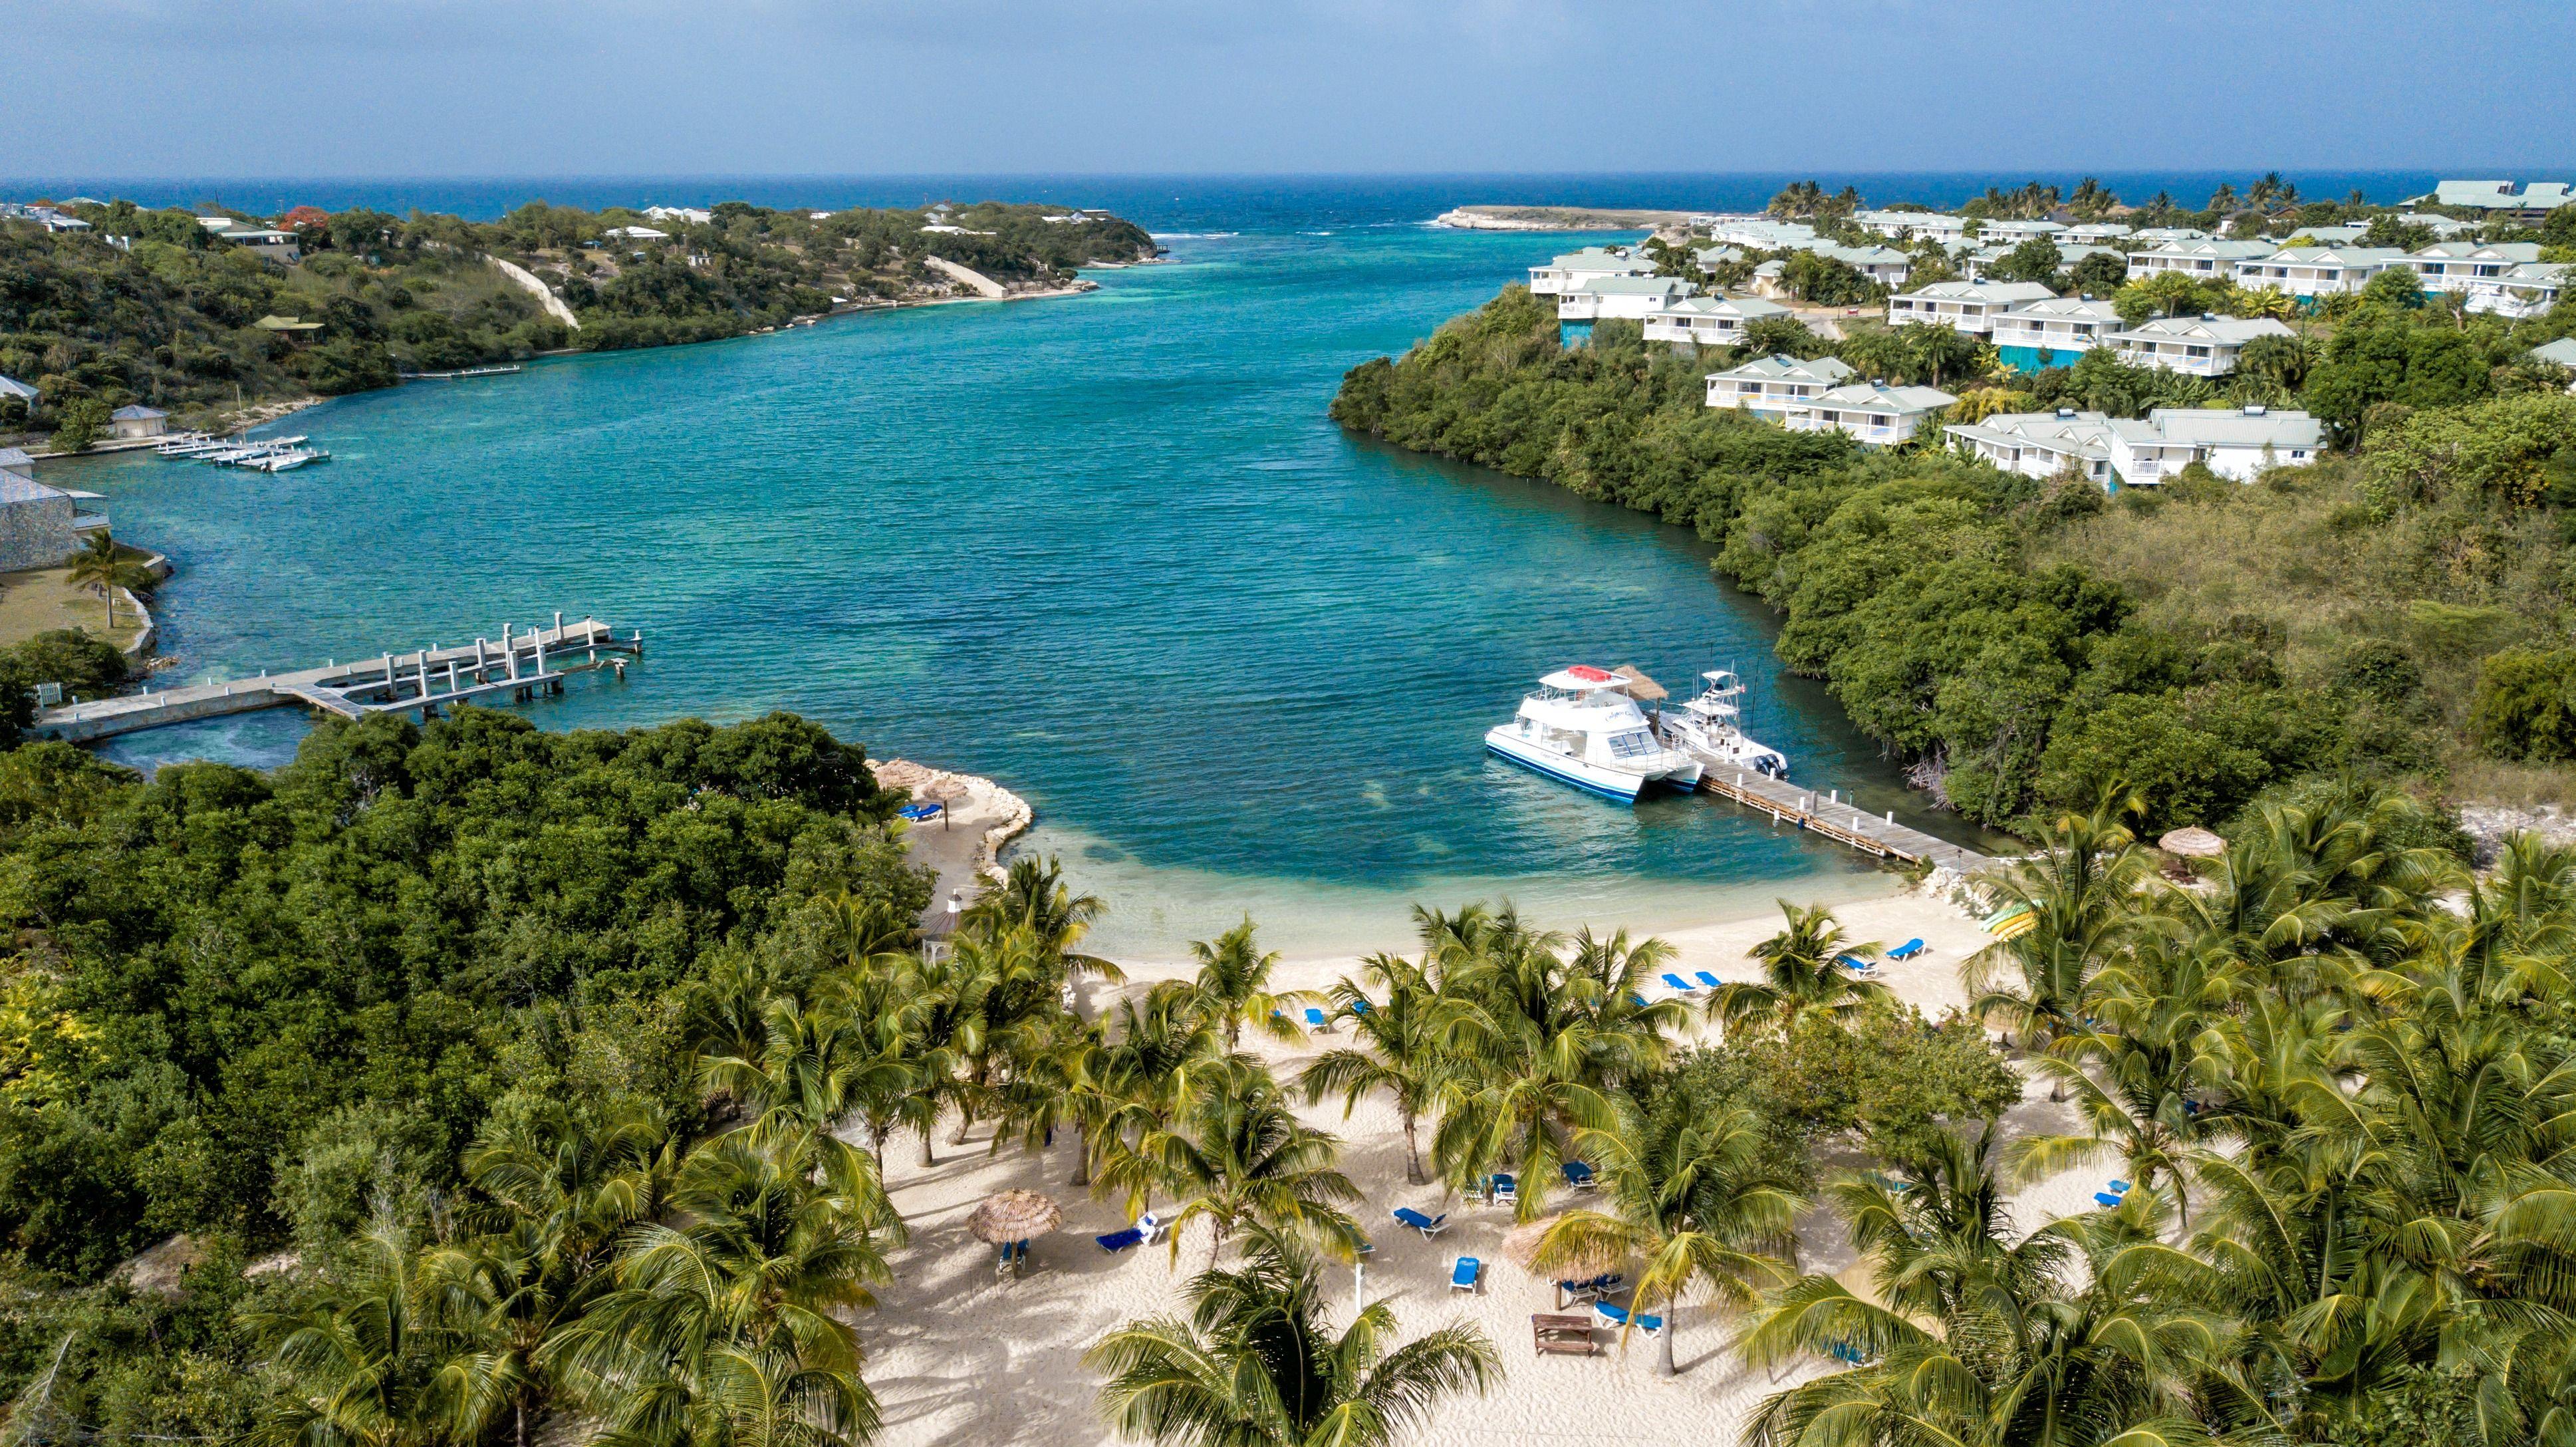 Pin by Elite Island Resorts on The Verandah Resort & Spa - Antigua   Veranda resort, Resort ...